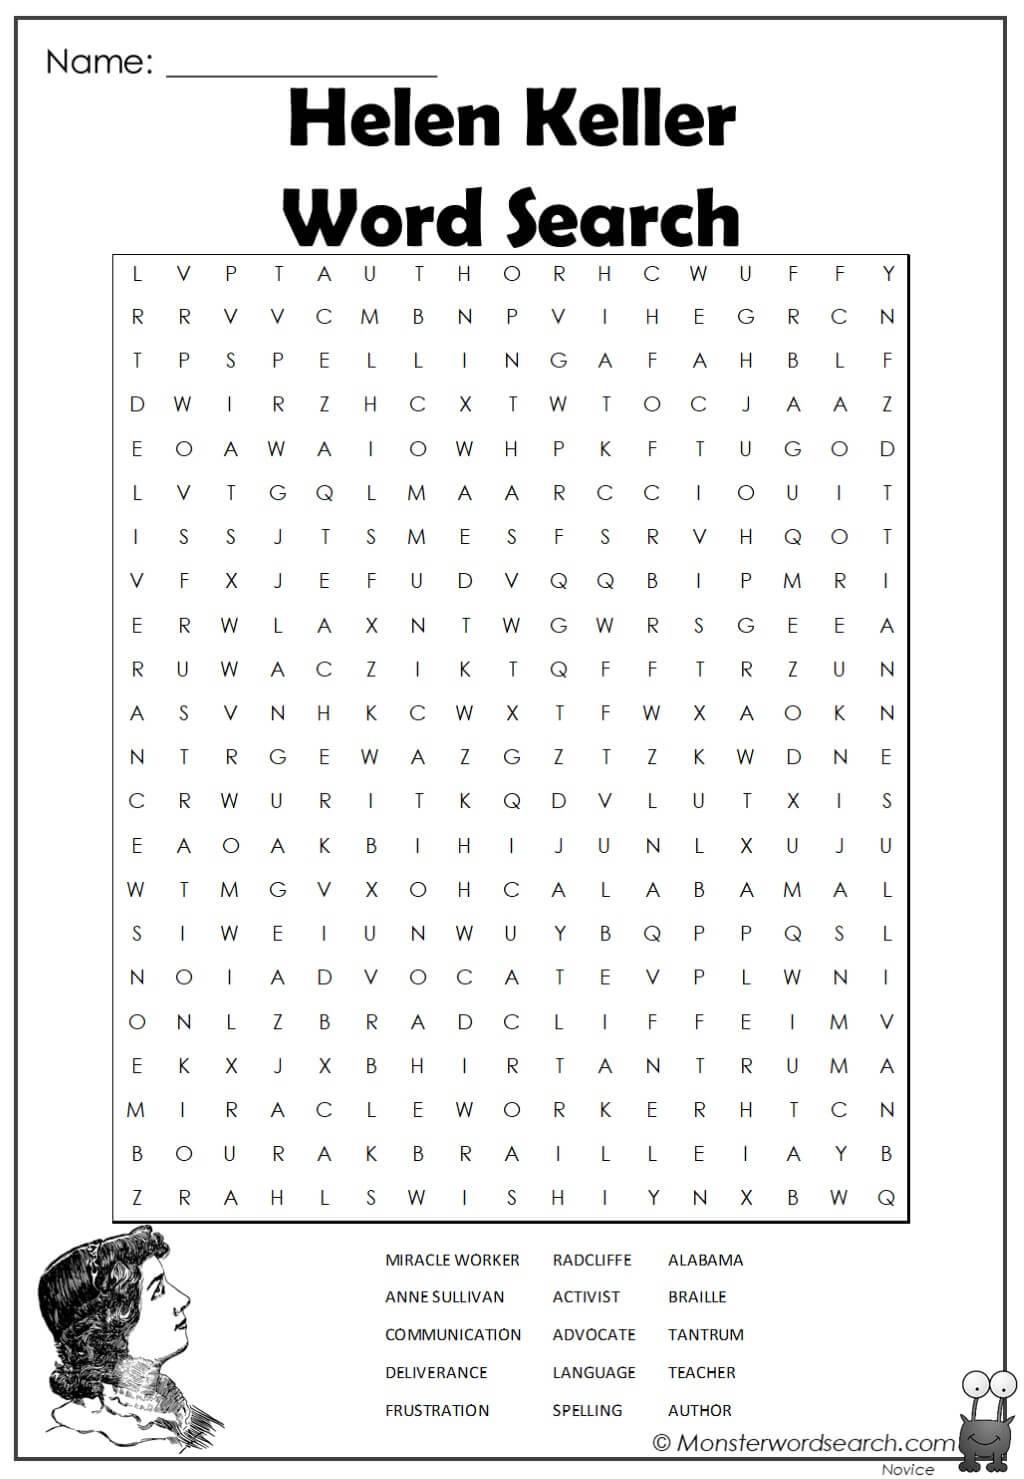 Helen Keller Word Search Monster Word Search